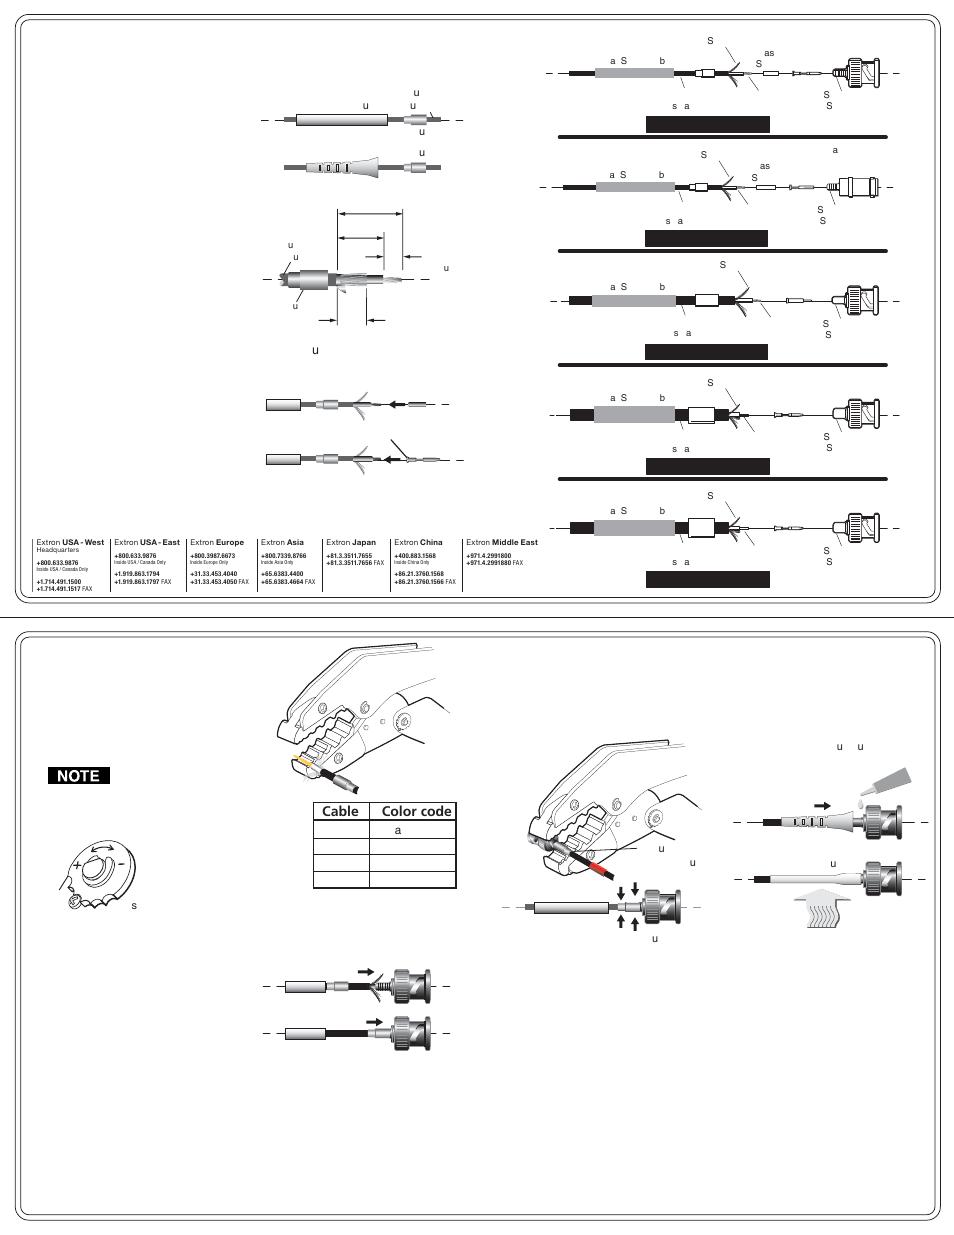 Extron Electronics Universal Cable BNC Crimp User Manual